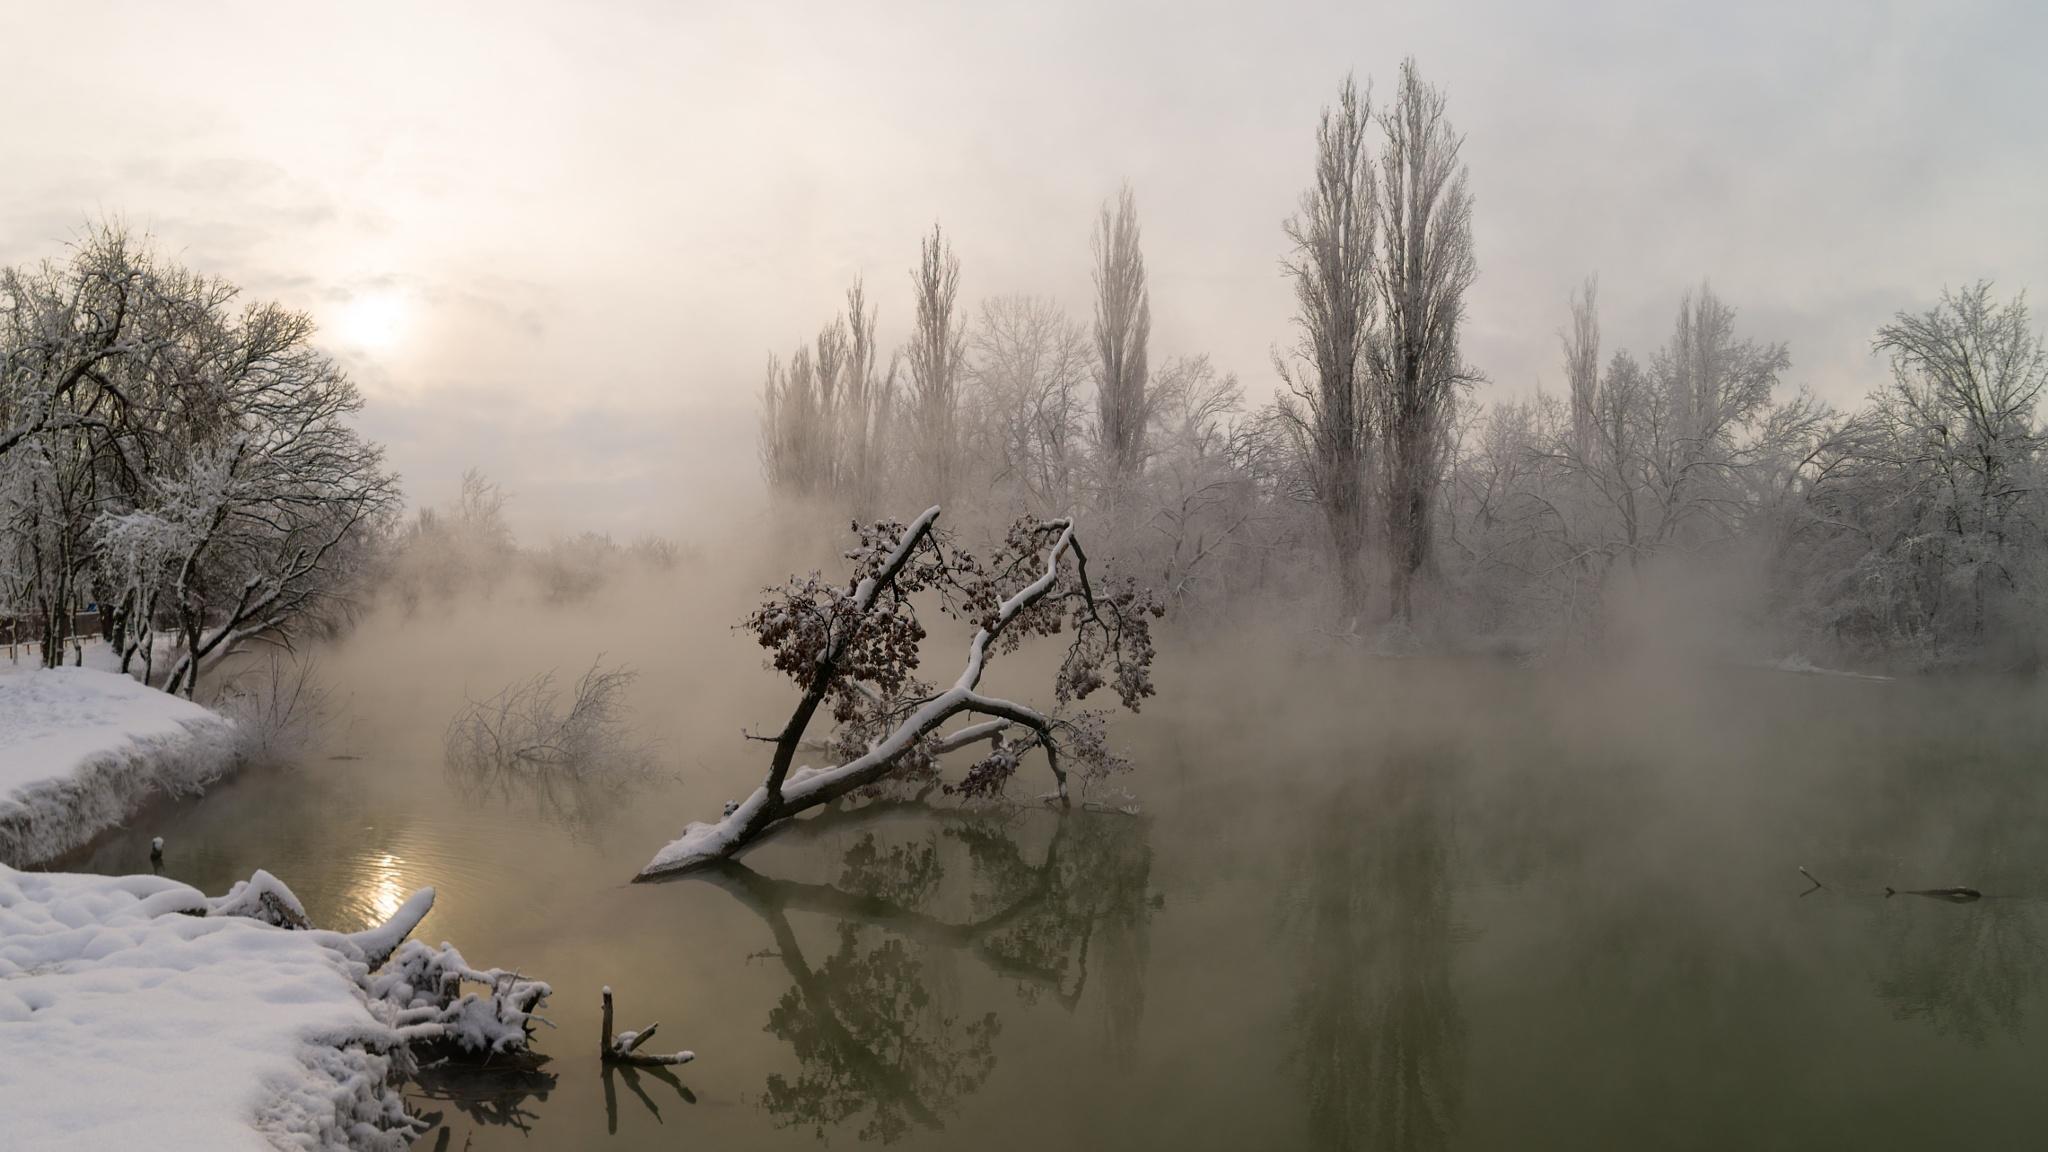 Winter morning by Alexander Plekhanov